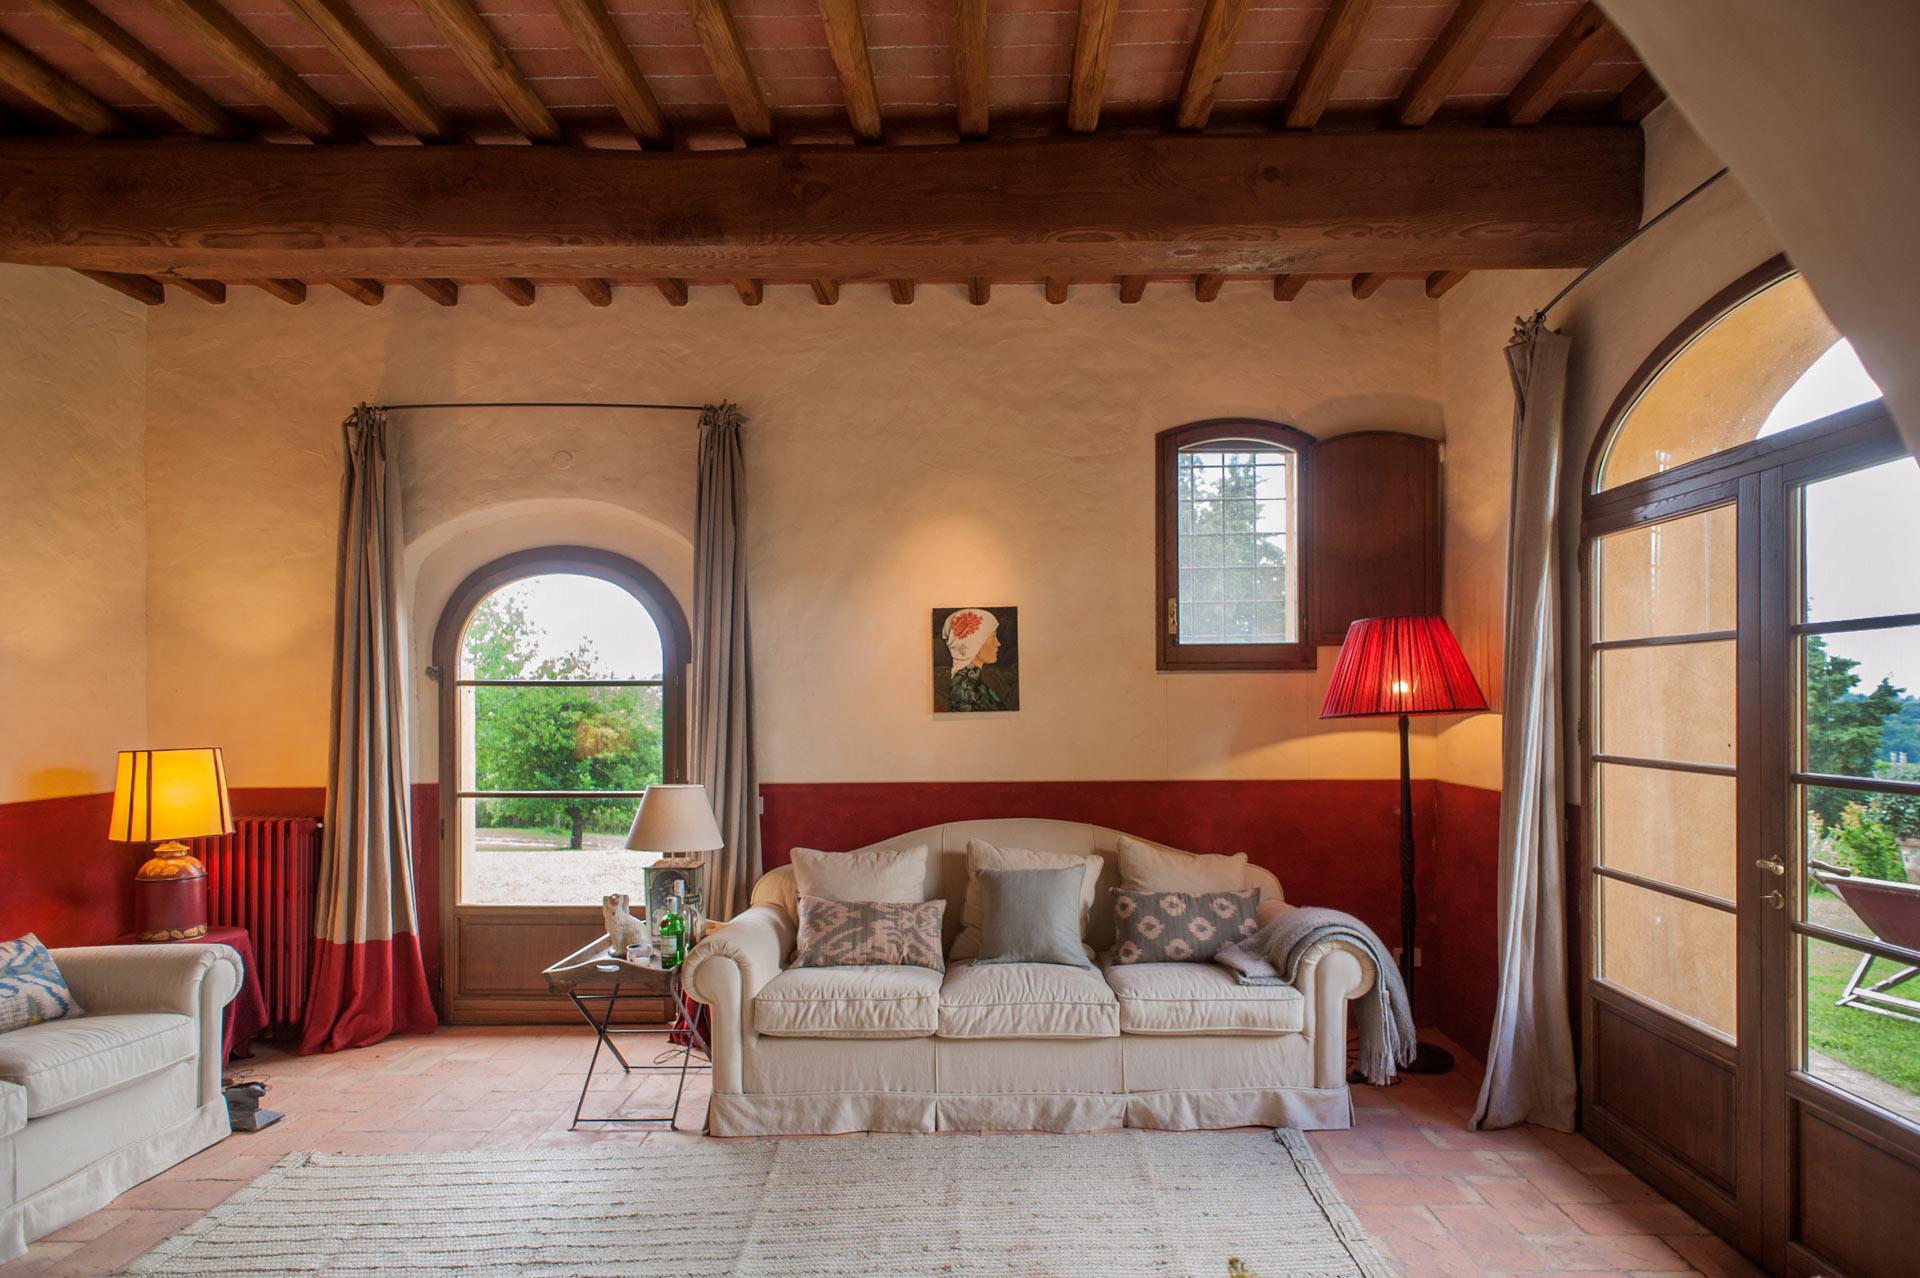 Toscana, 2012 (2)